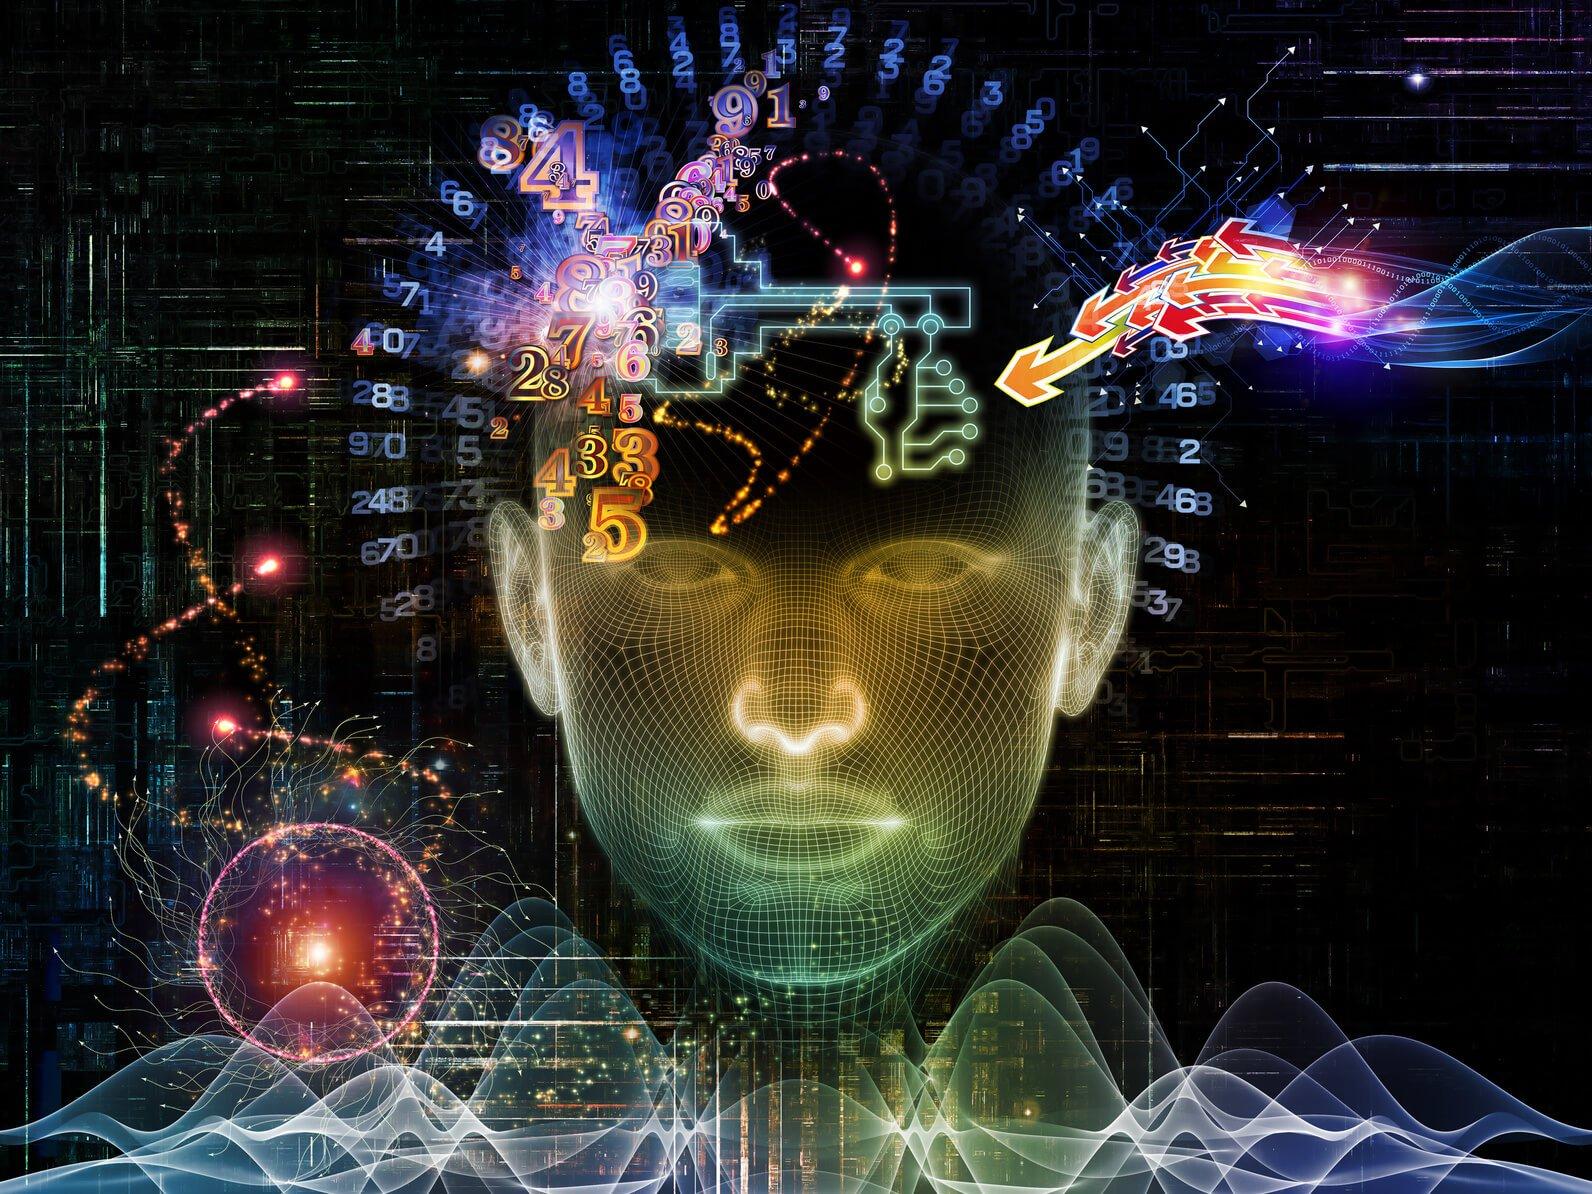 AI multilingual chatbot technology imagination